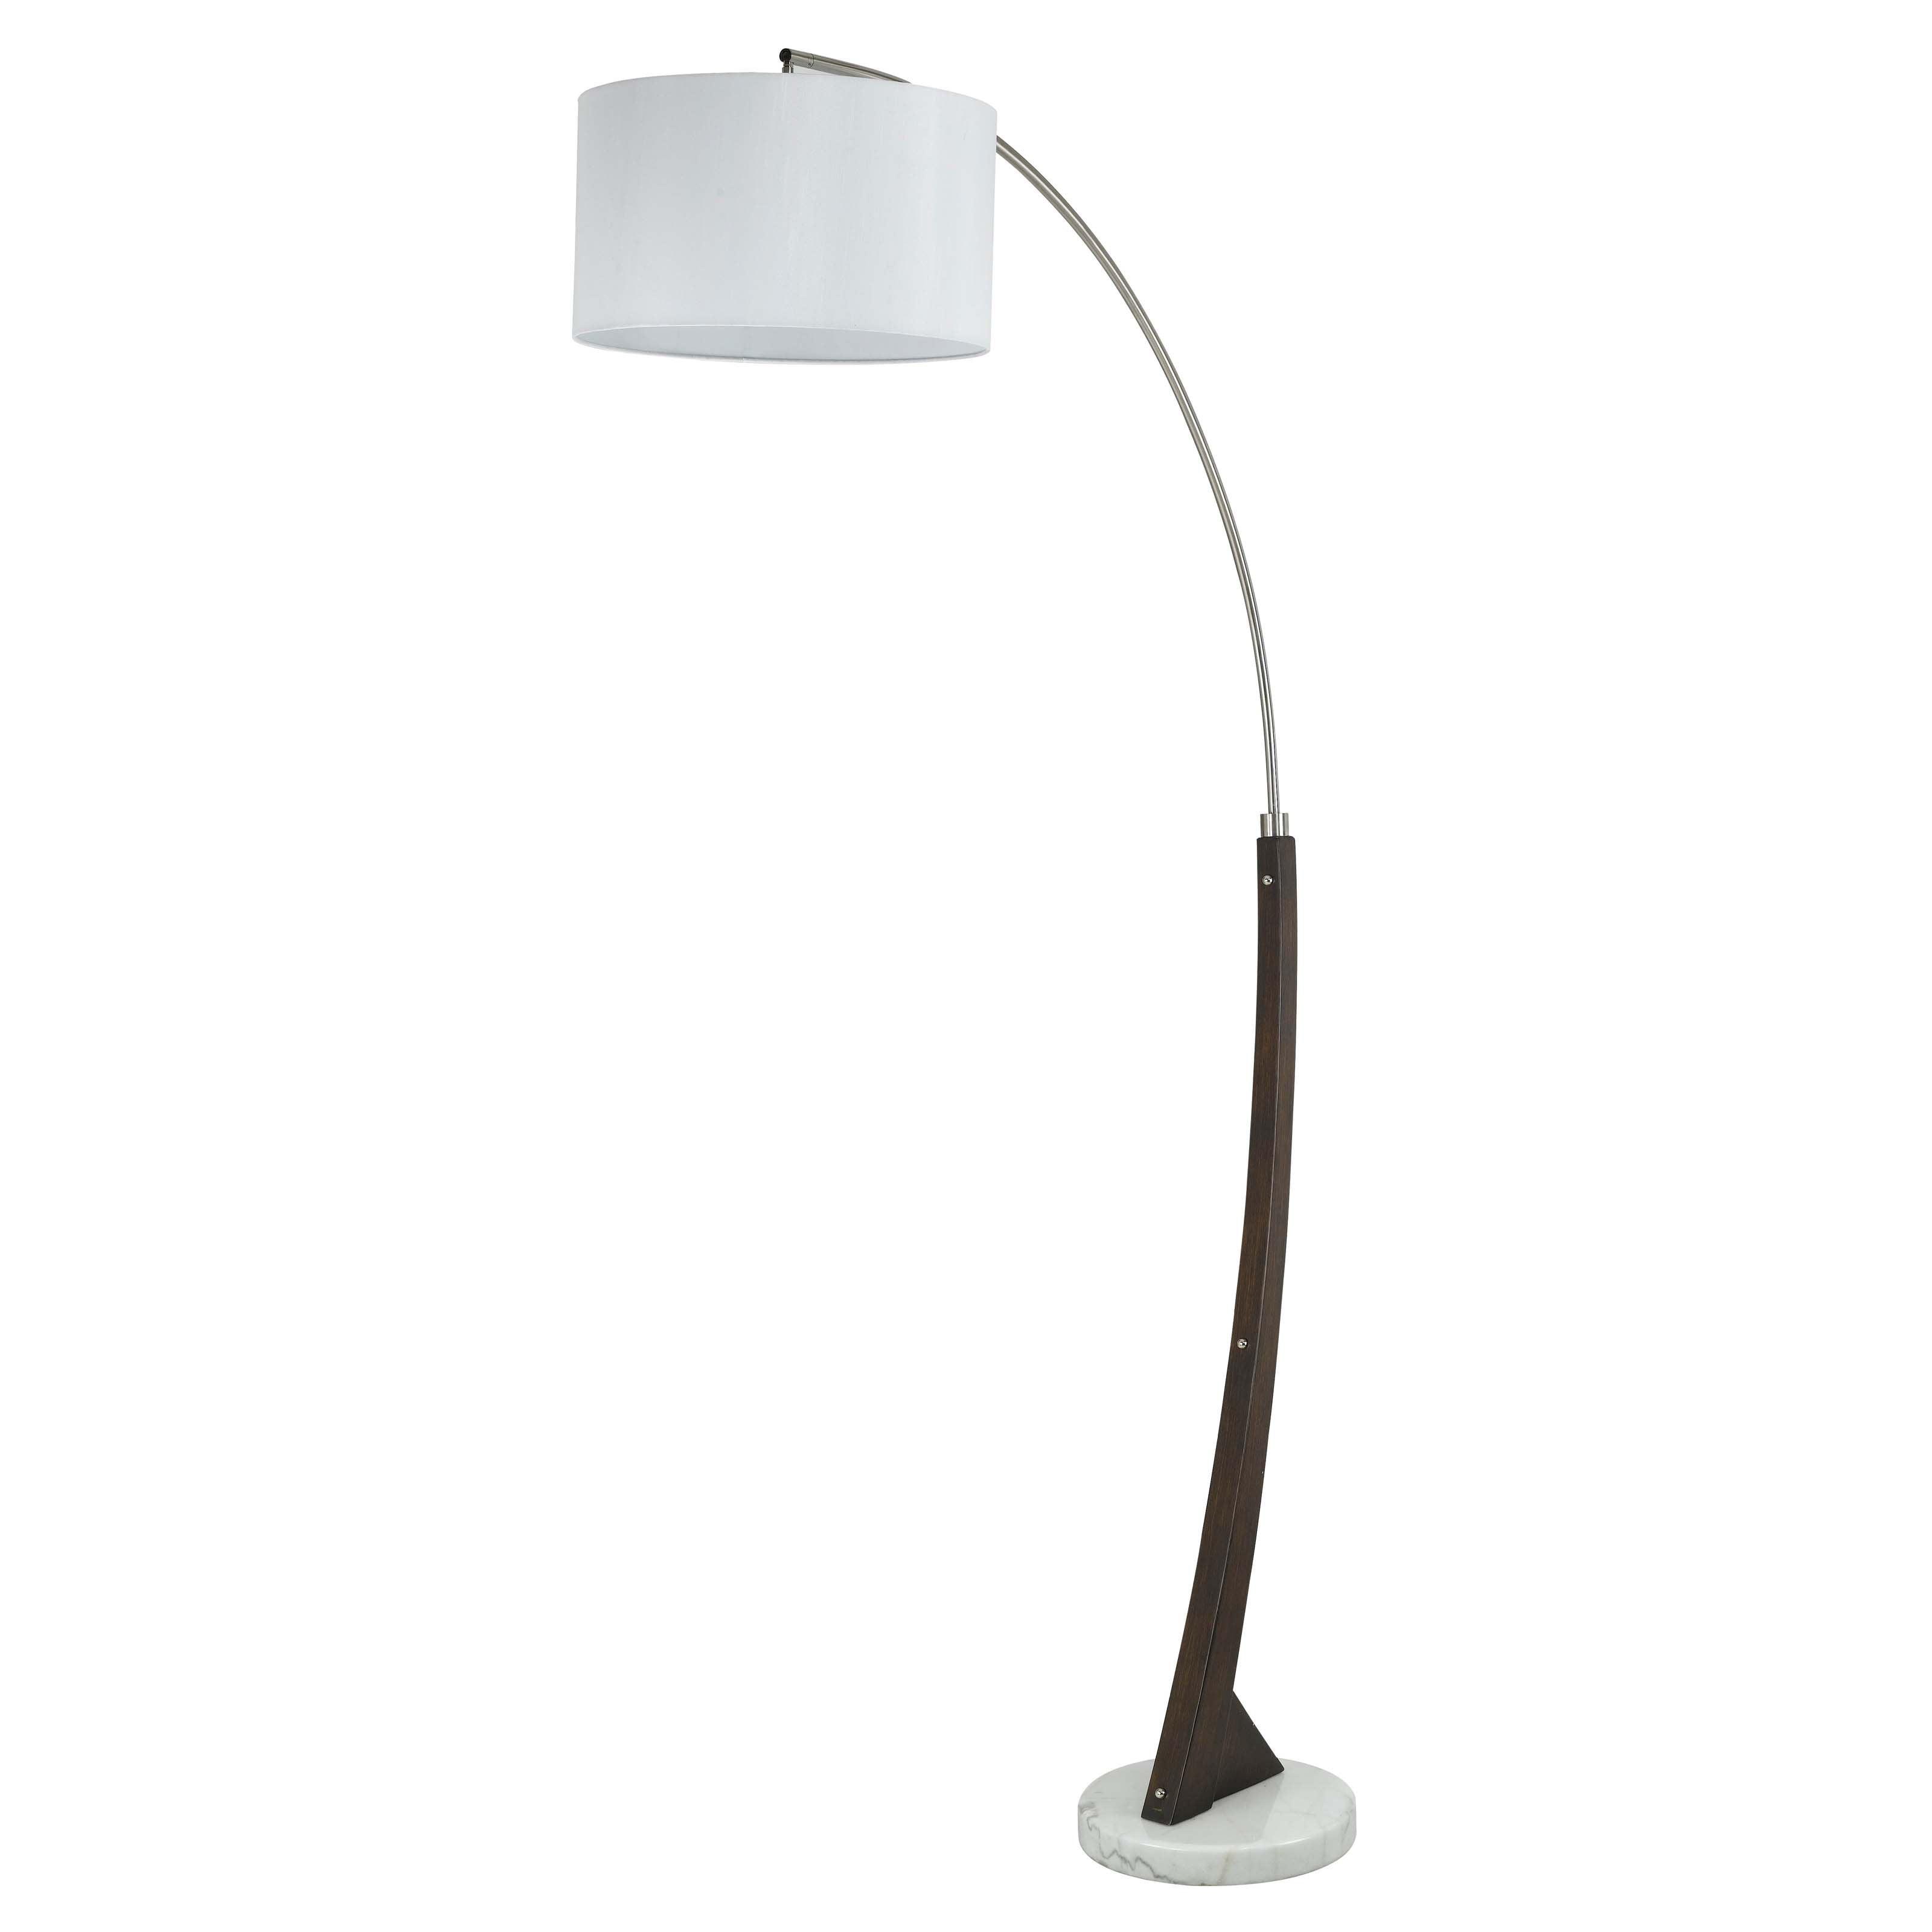 Cal Lighting BO-2033 Arc Floor Lamp with Hardback Fabric Shade by CAL Lighting